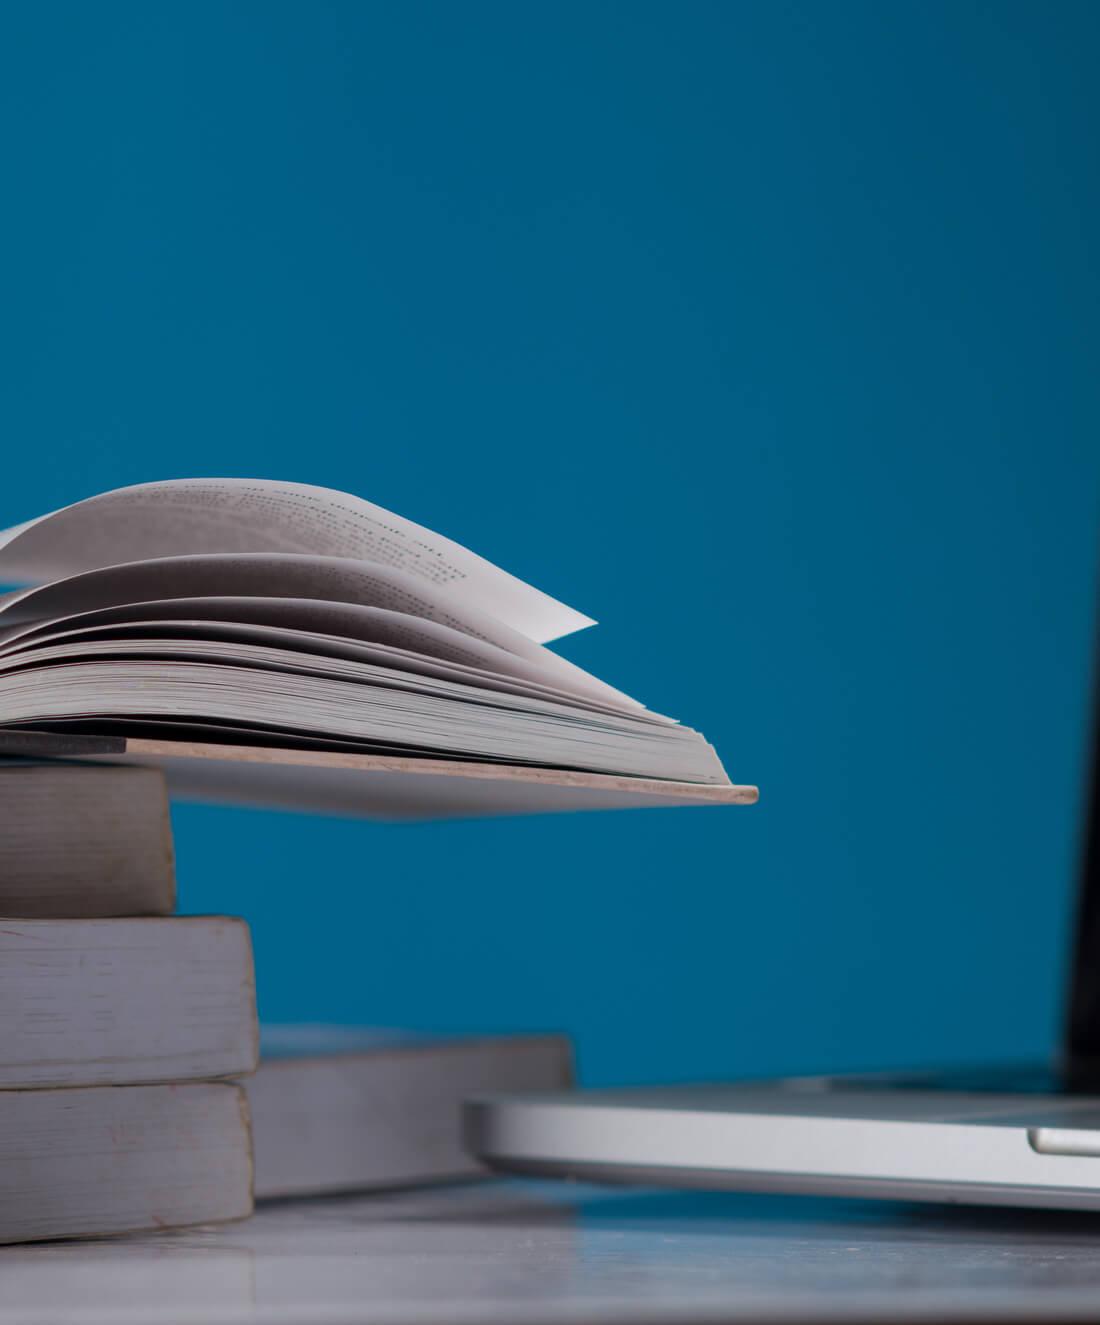 39 заявок за 3 недели для Онлайн Школы - кейс iPapus Agency